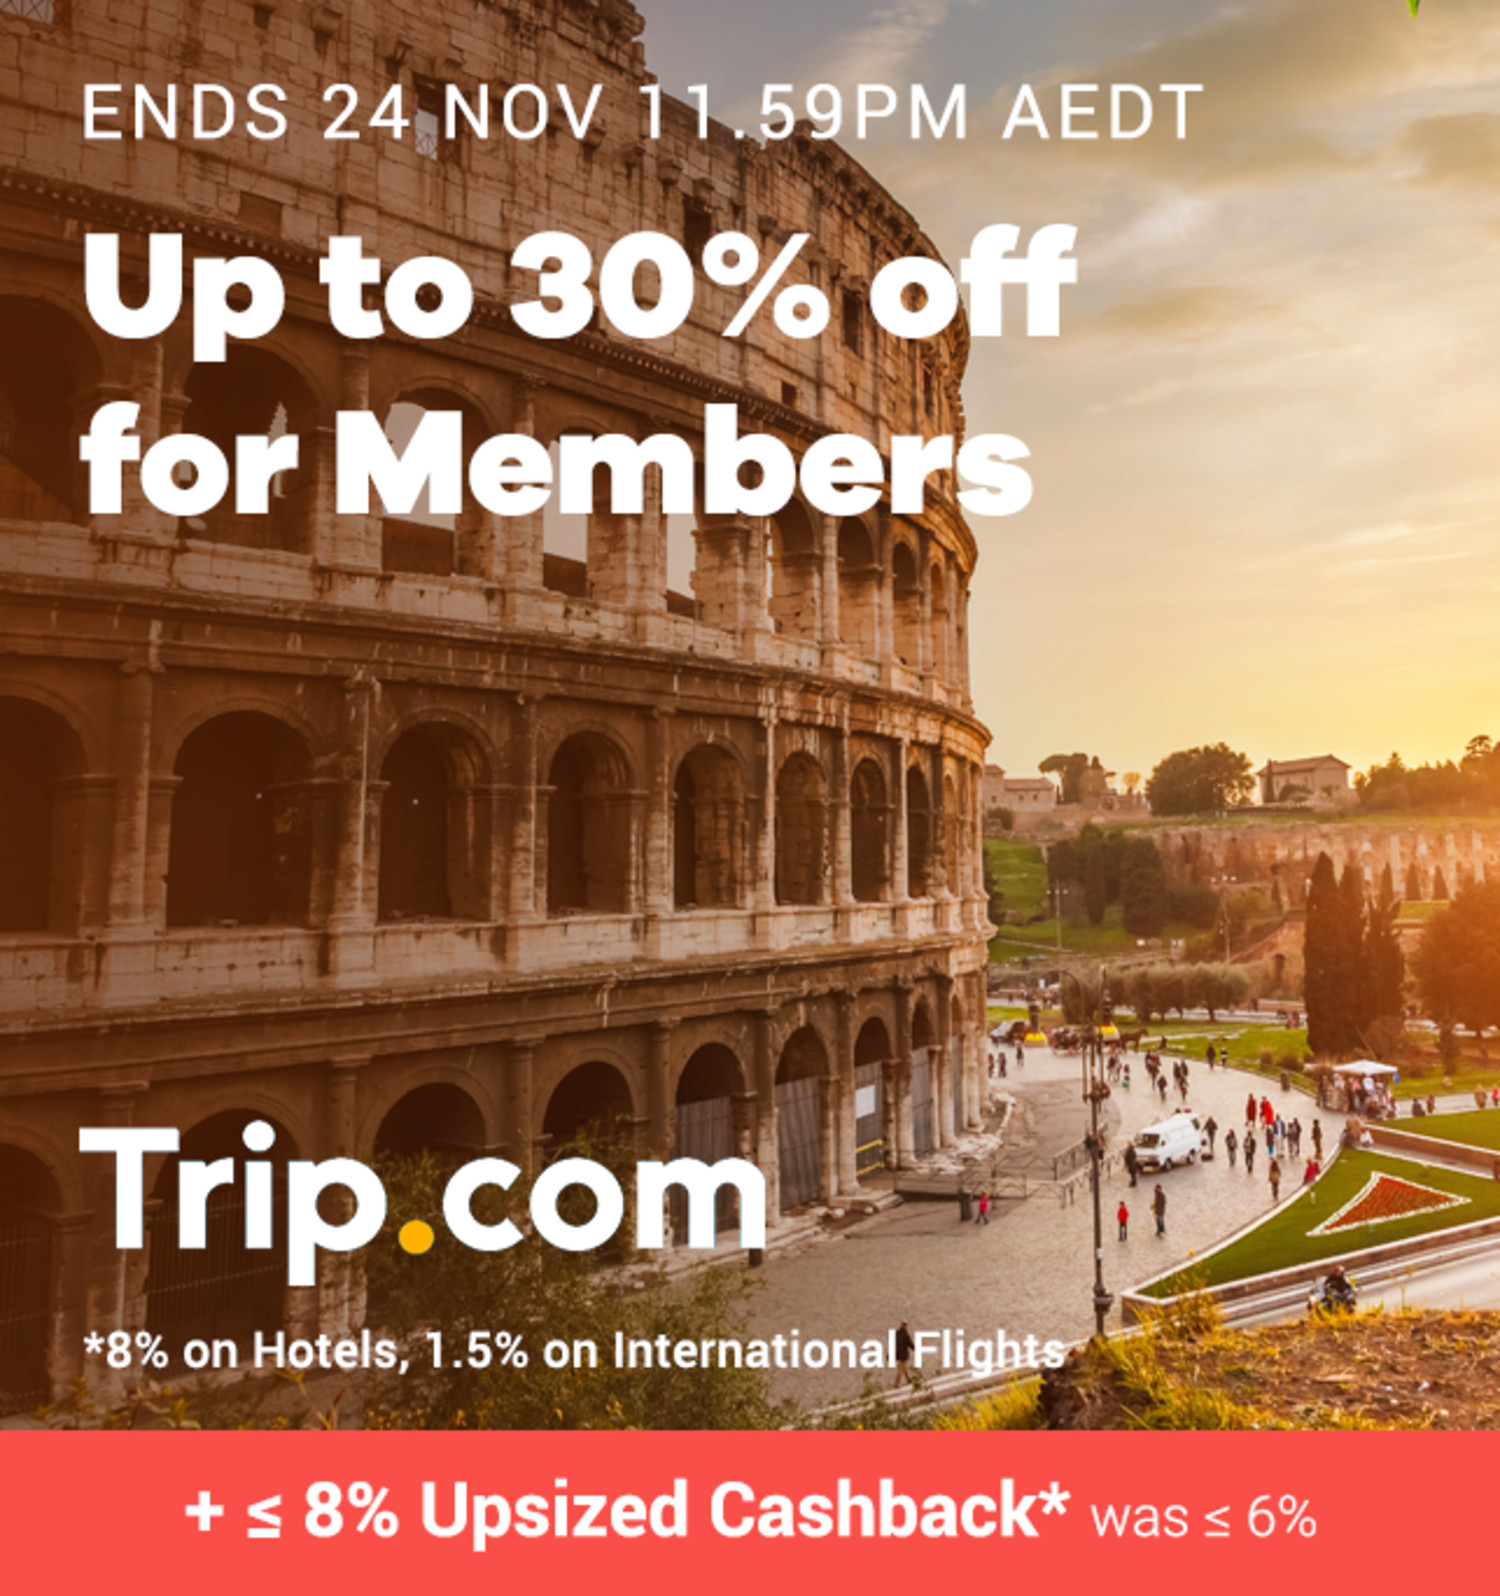 Trip.com - Up to 8% Upsized Cashback (November 2019)